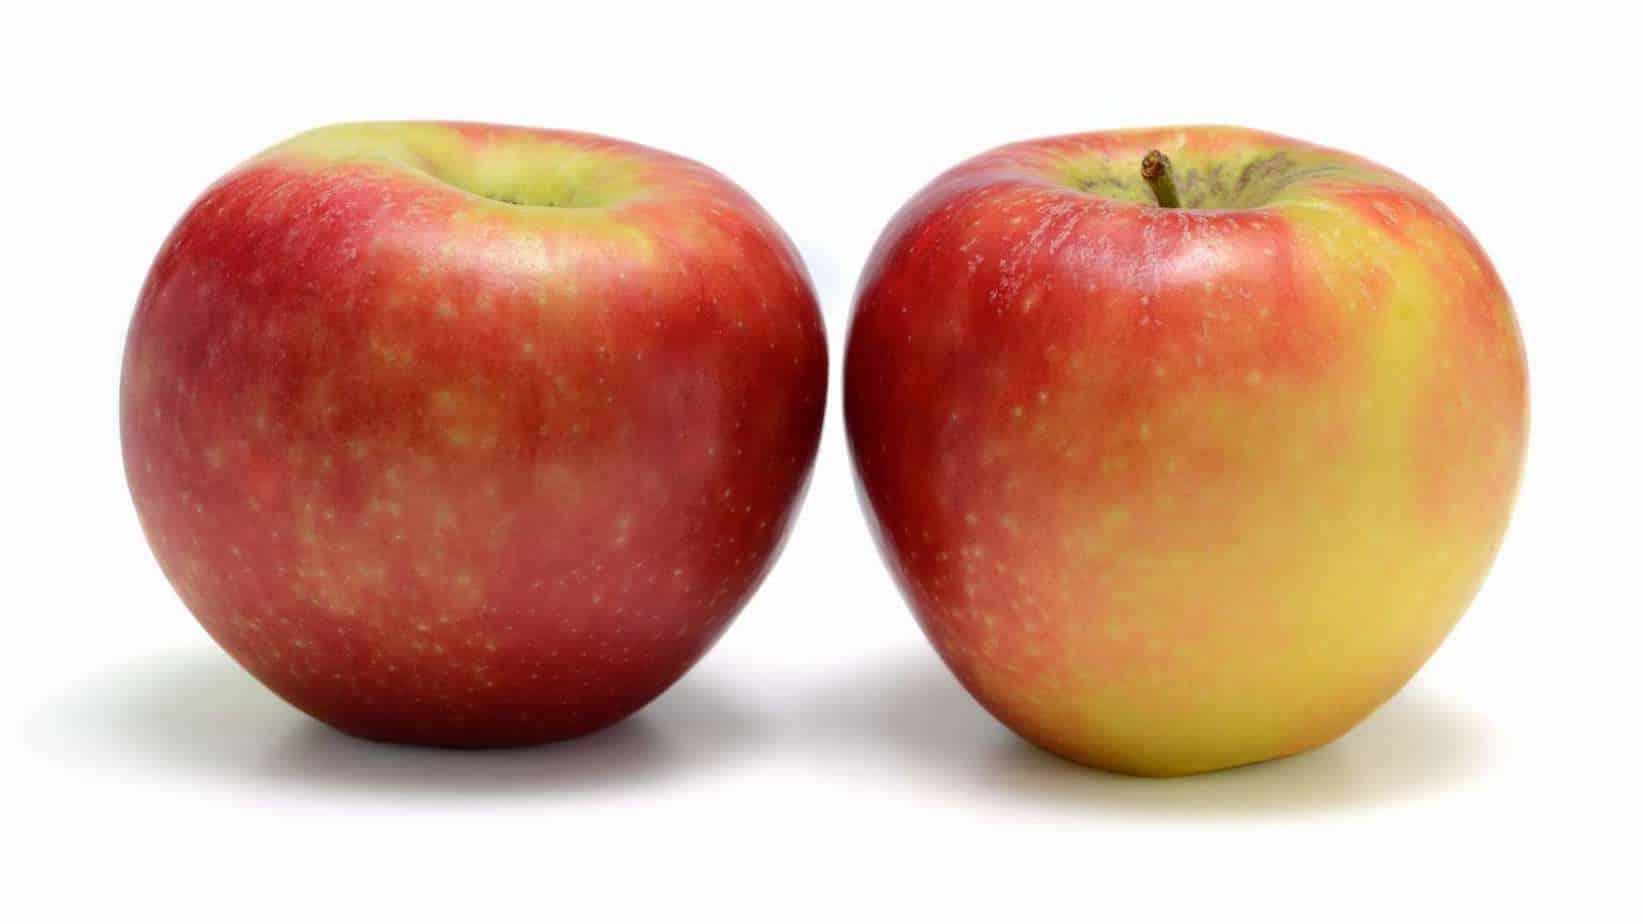 York Imperial Apple